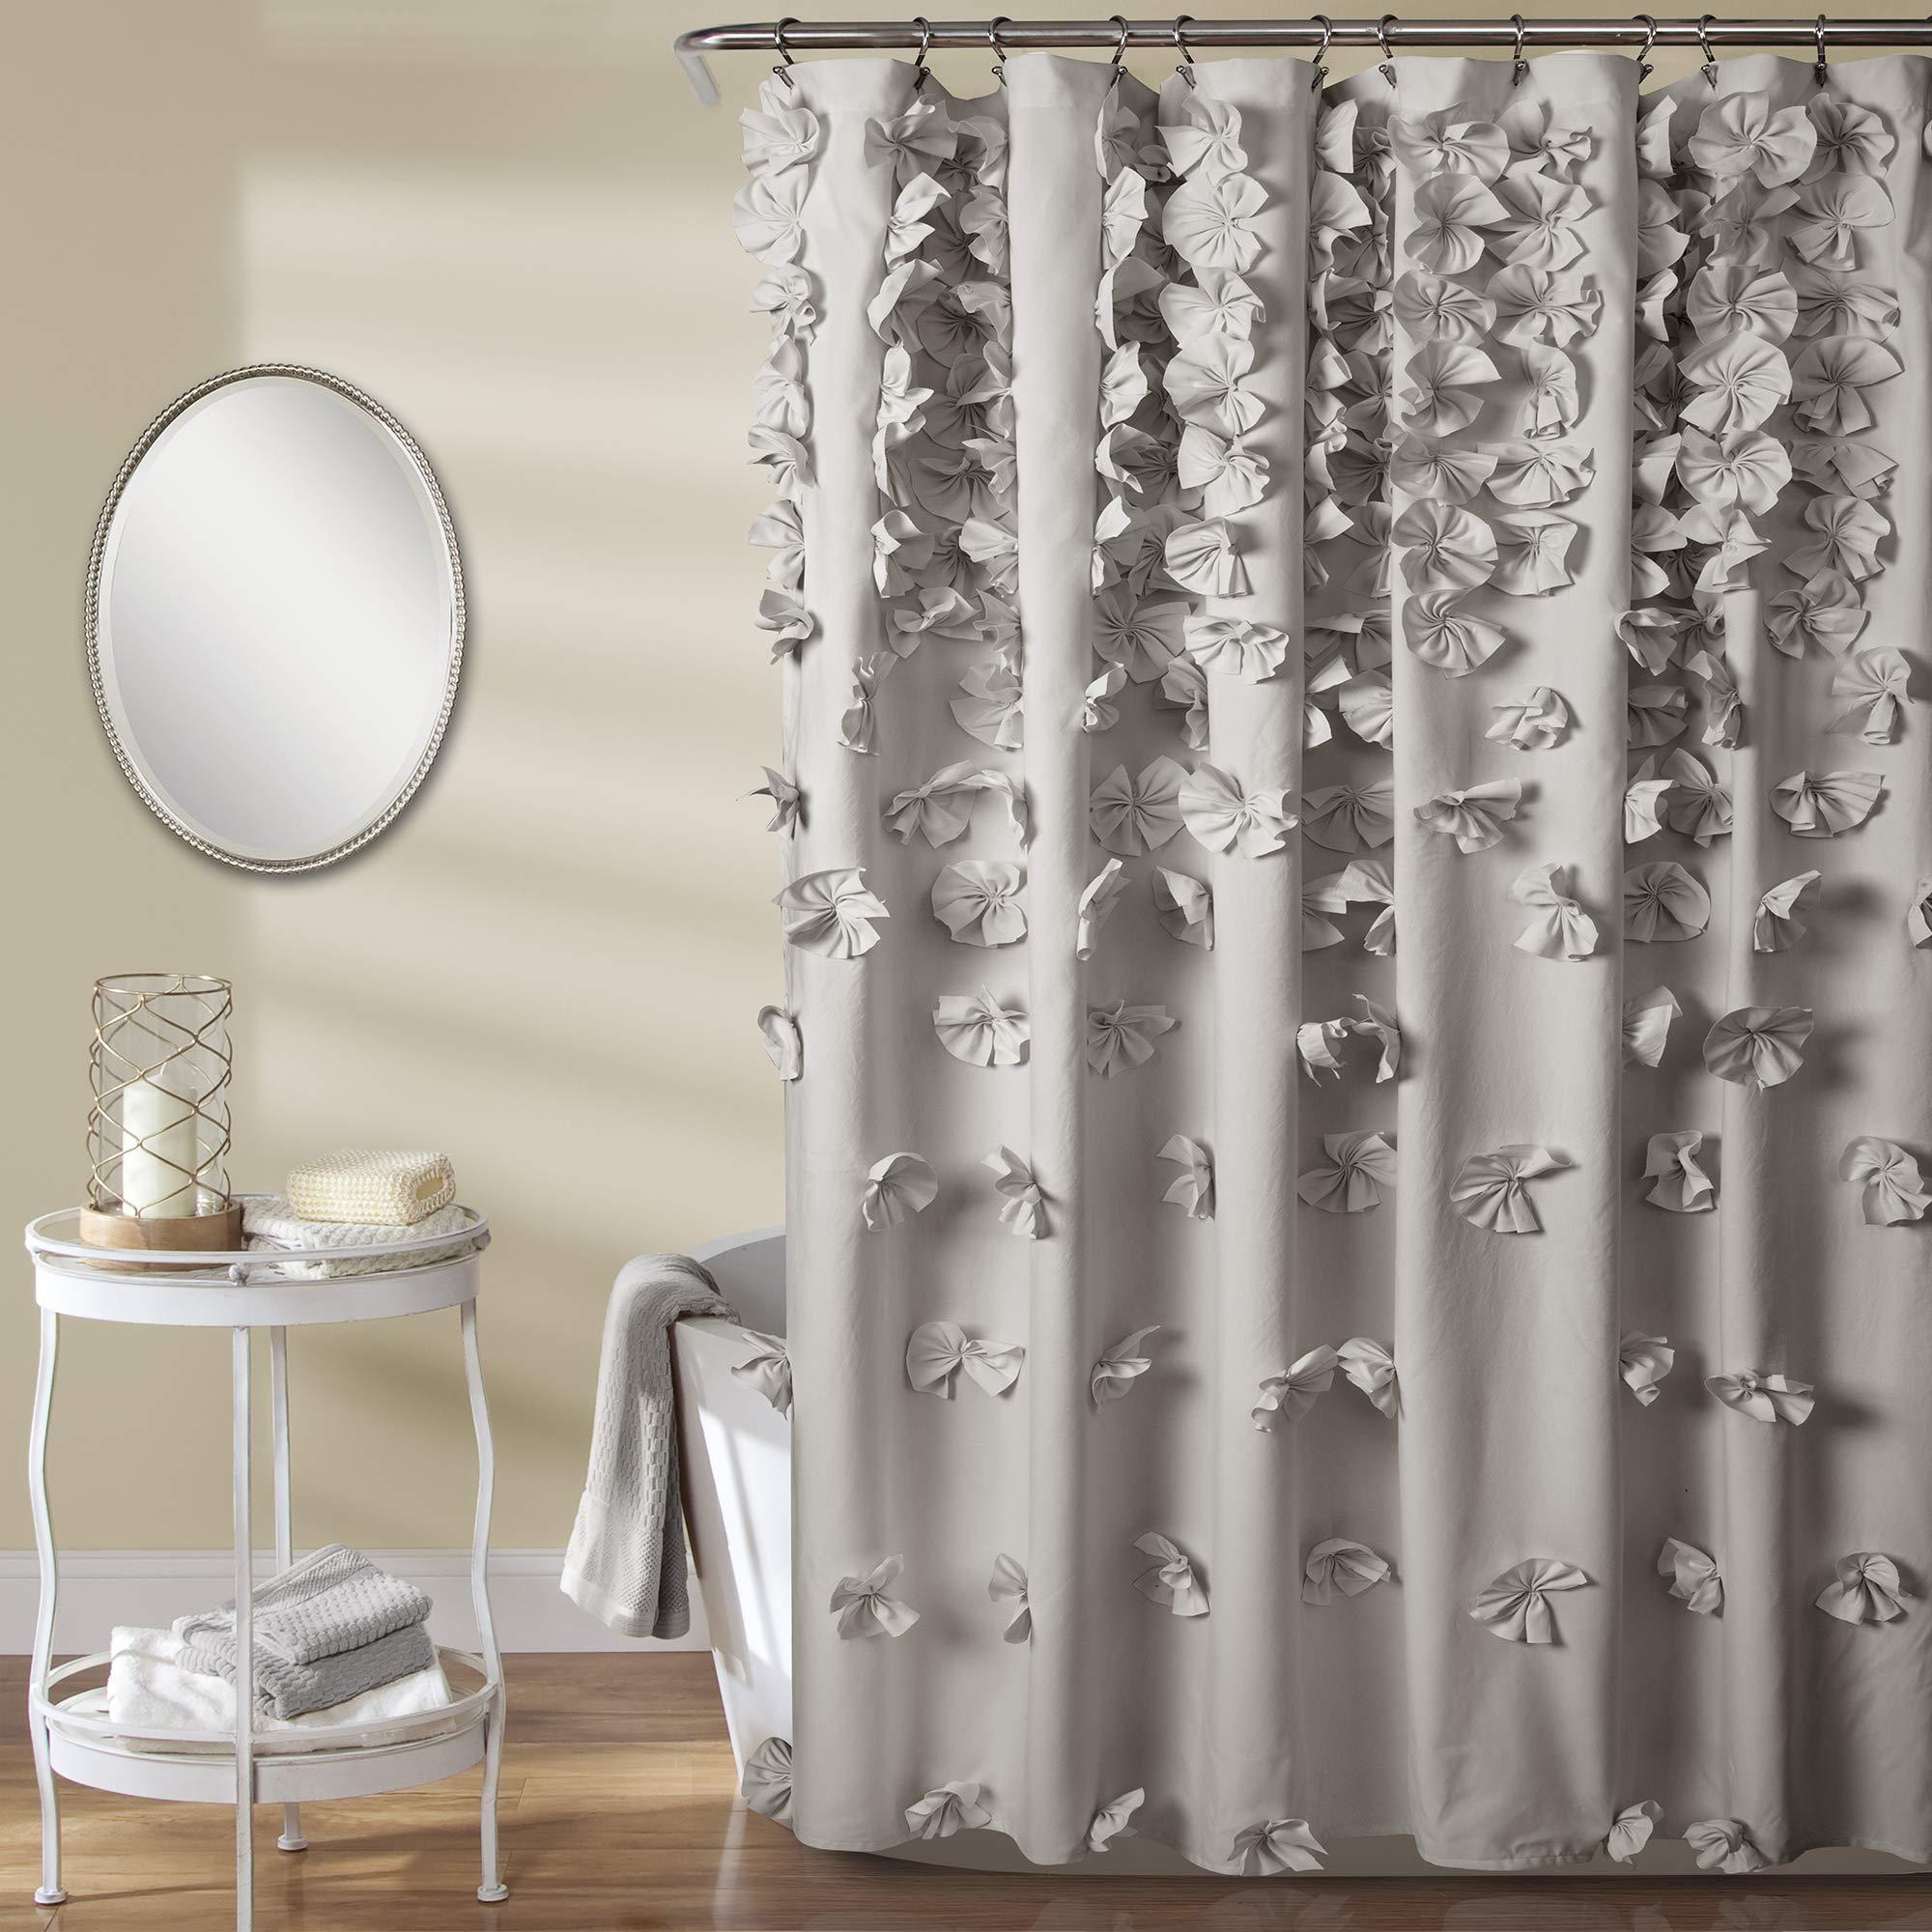 Lush Decor Riley Shower Curtain, 72'' x 72'', Light Gray